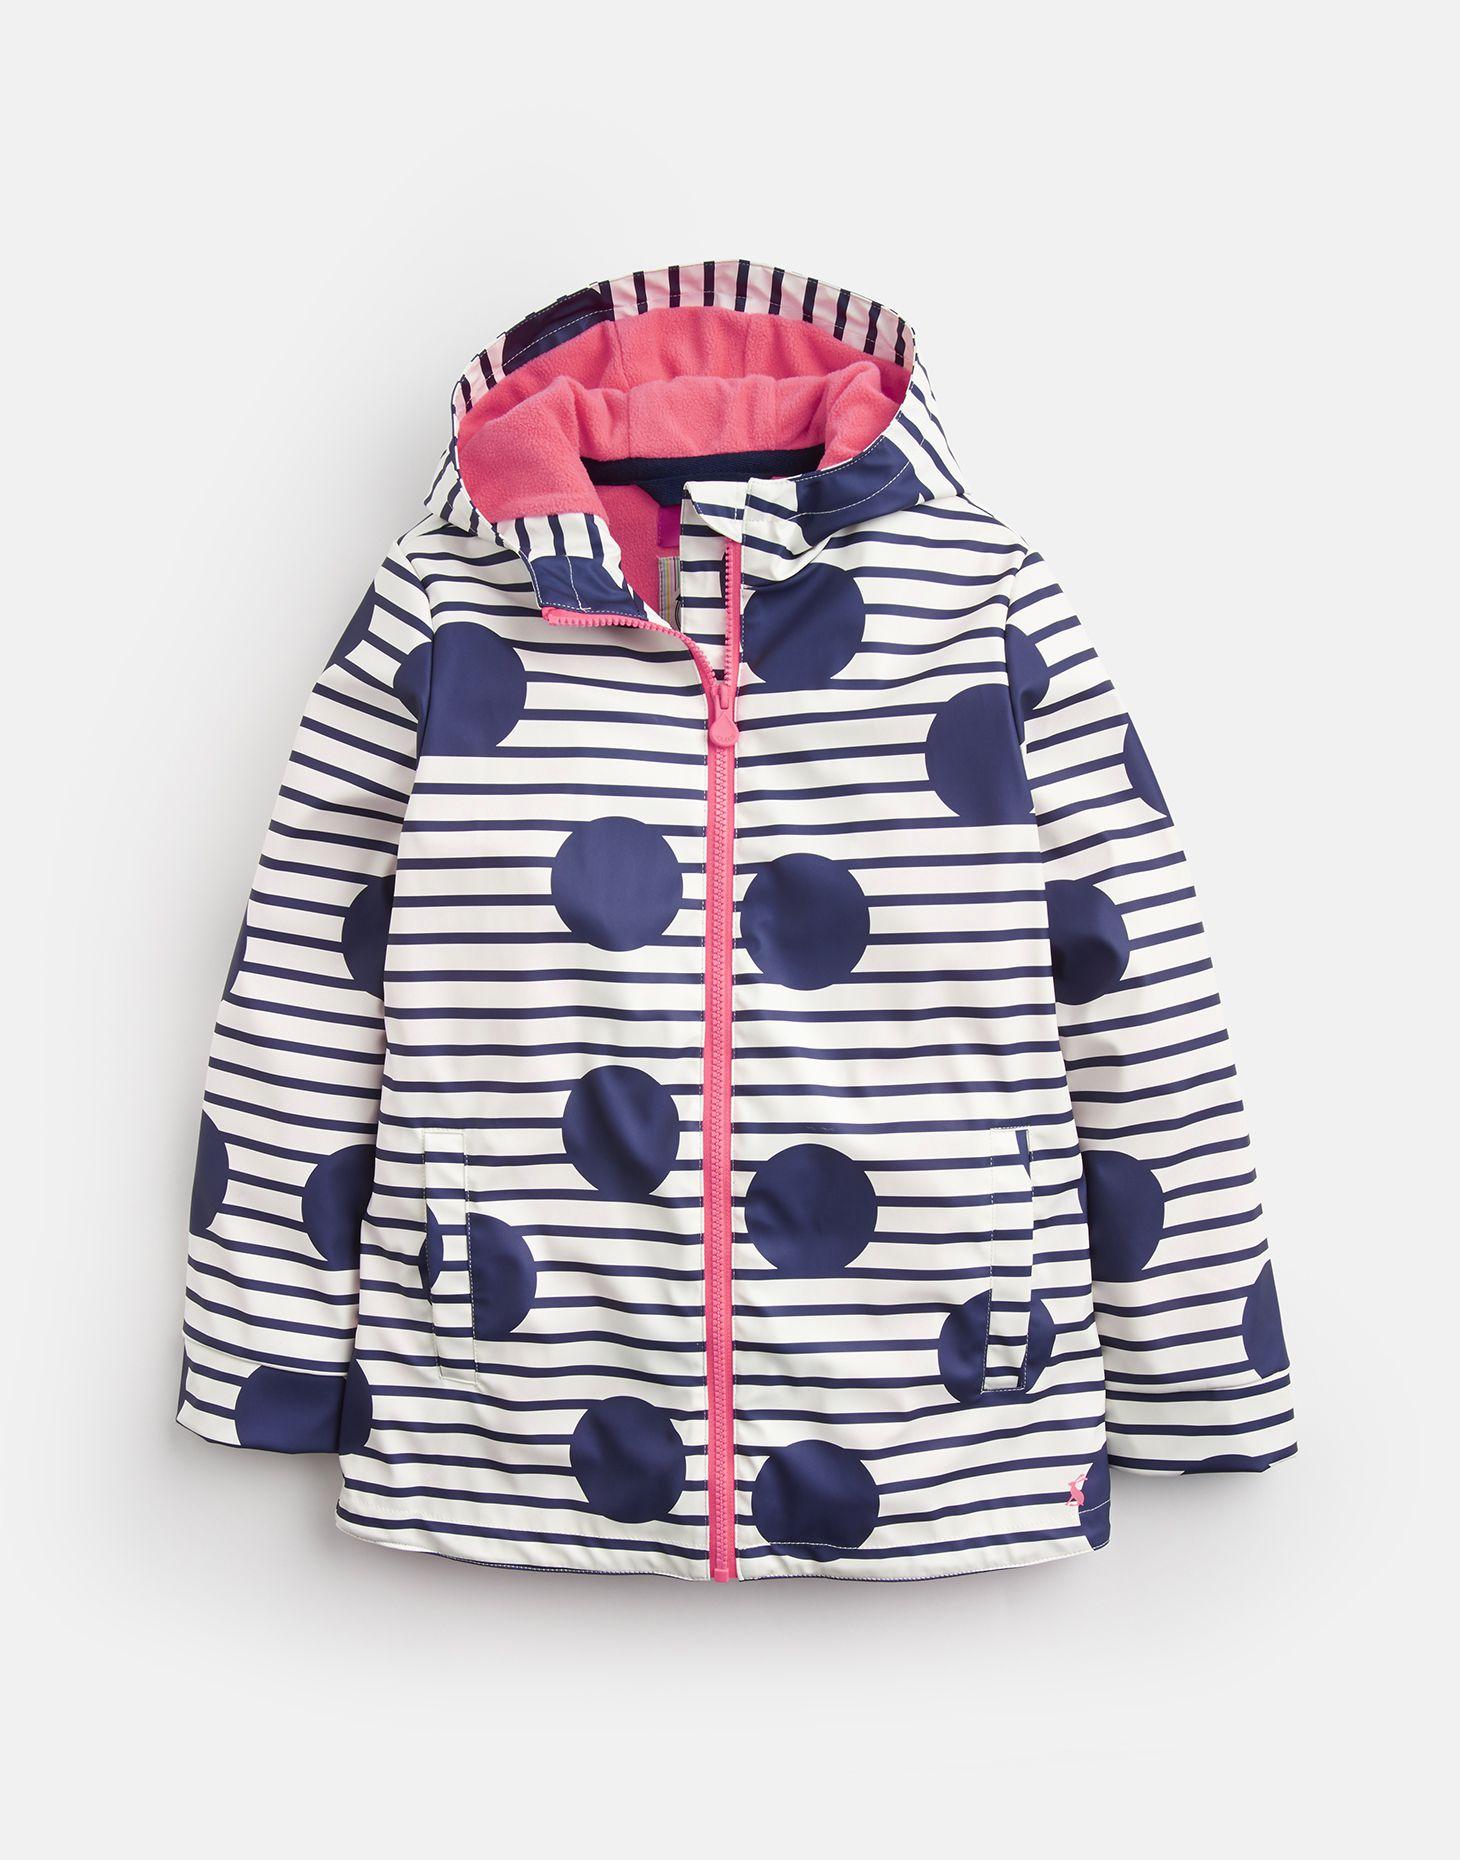 5d6320694 Raindance BLUE LARGE SPOT AND STRIPE Waterproof Rubber Coat 3-12 Yr ...